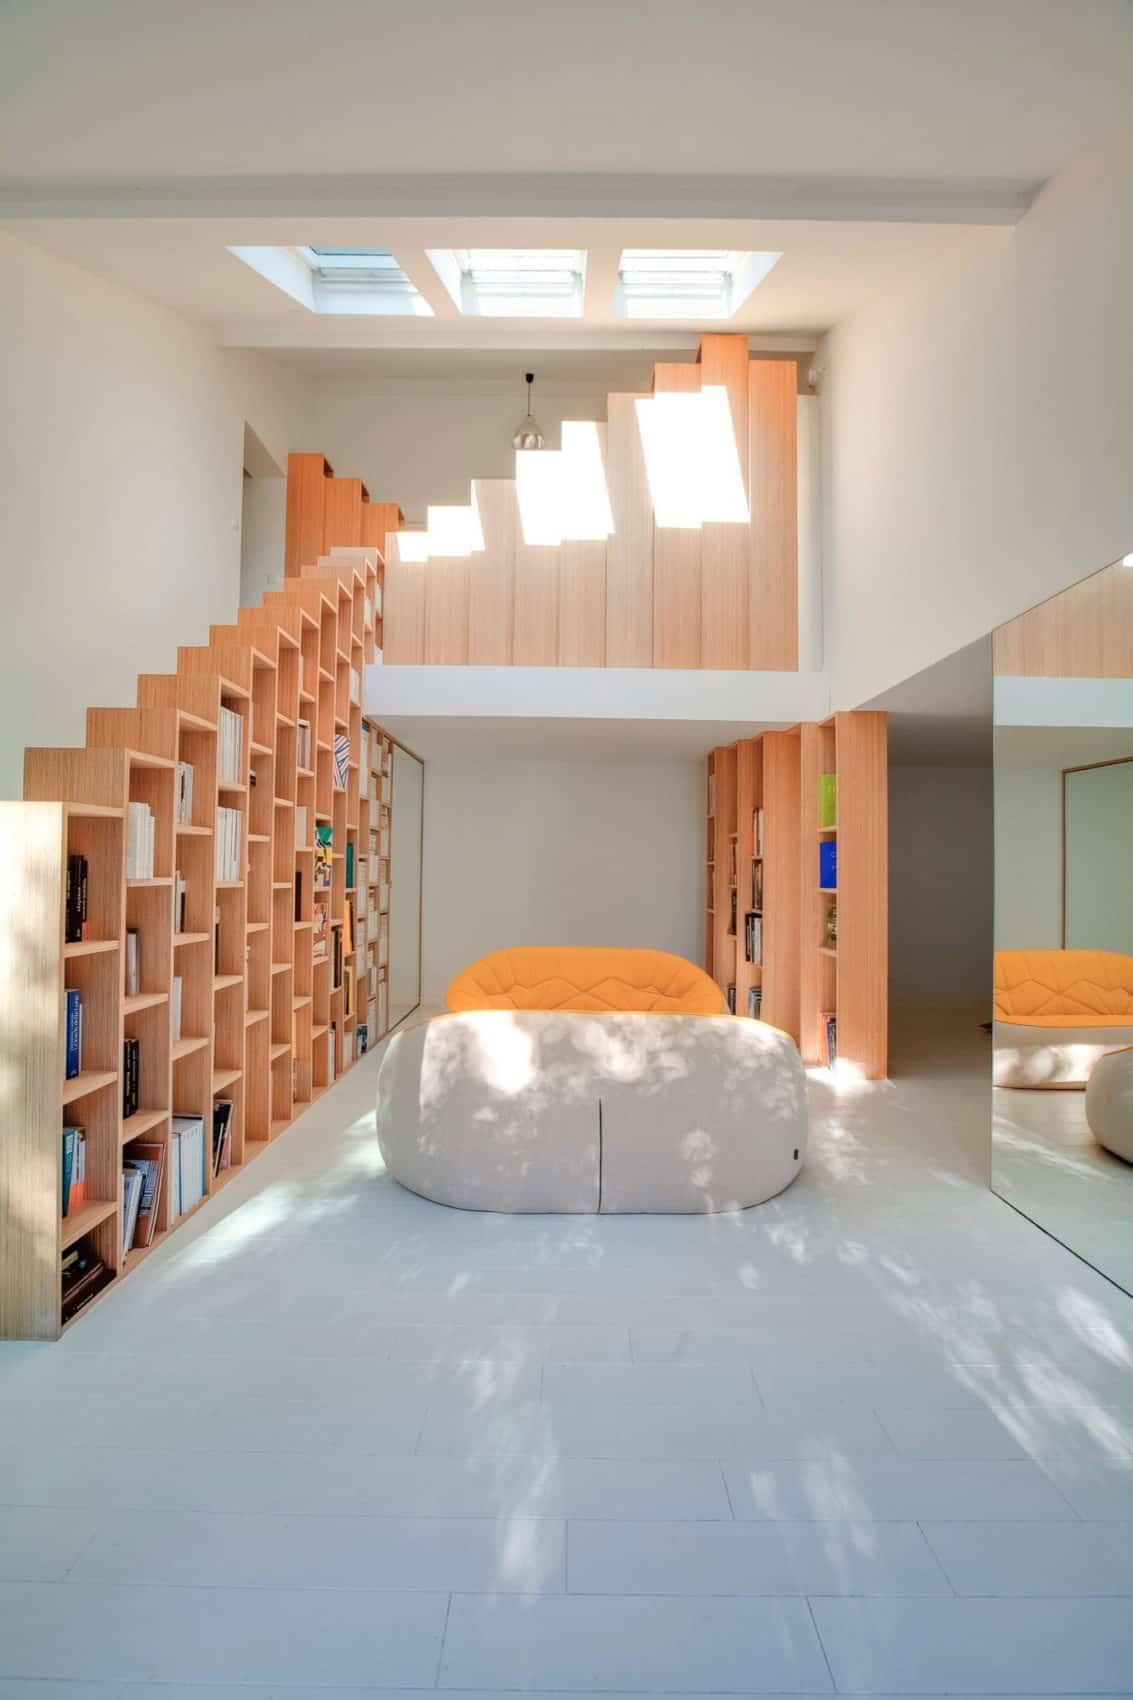 Bookshelf House by Andrea Mosca Creative Studio (2)